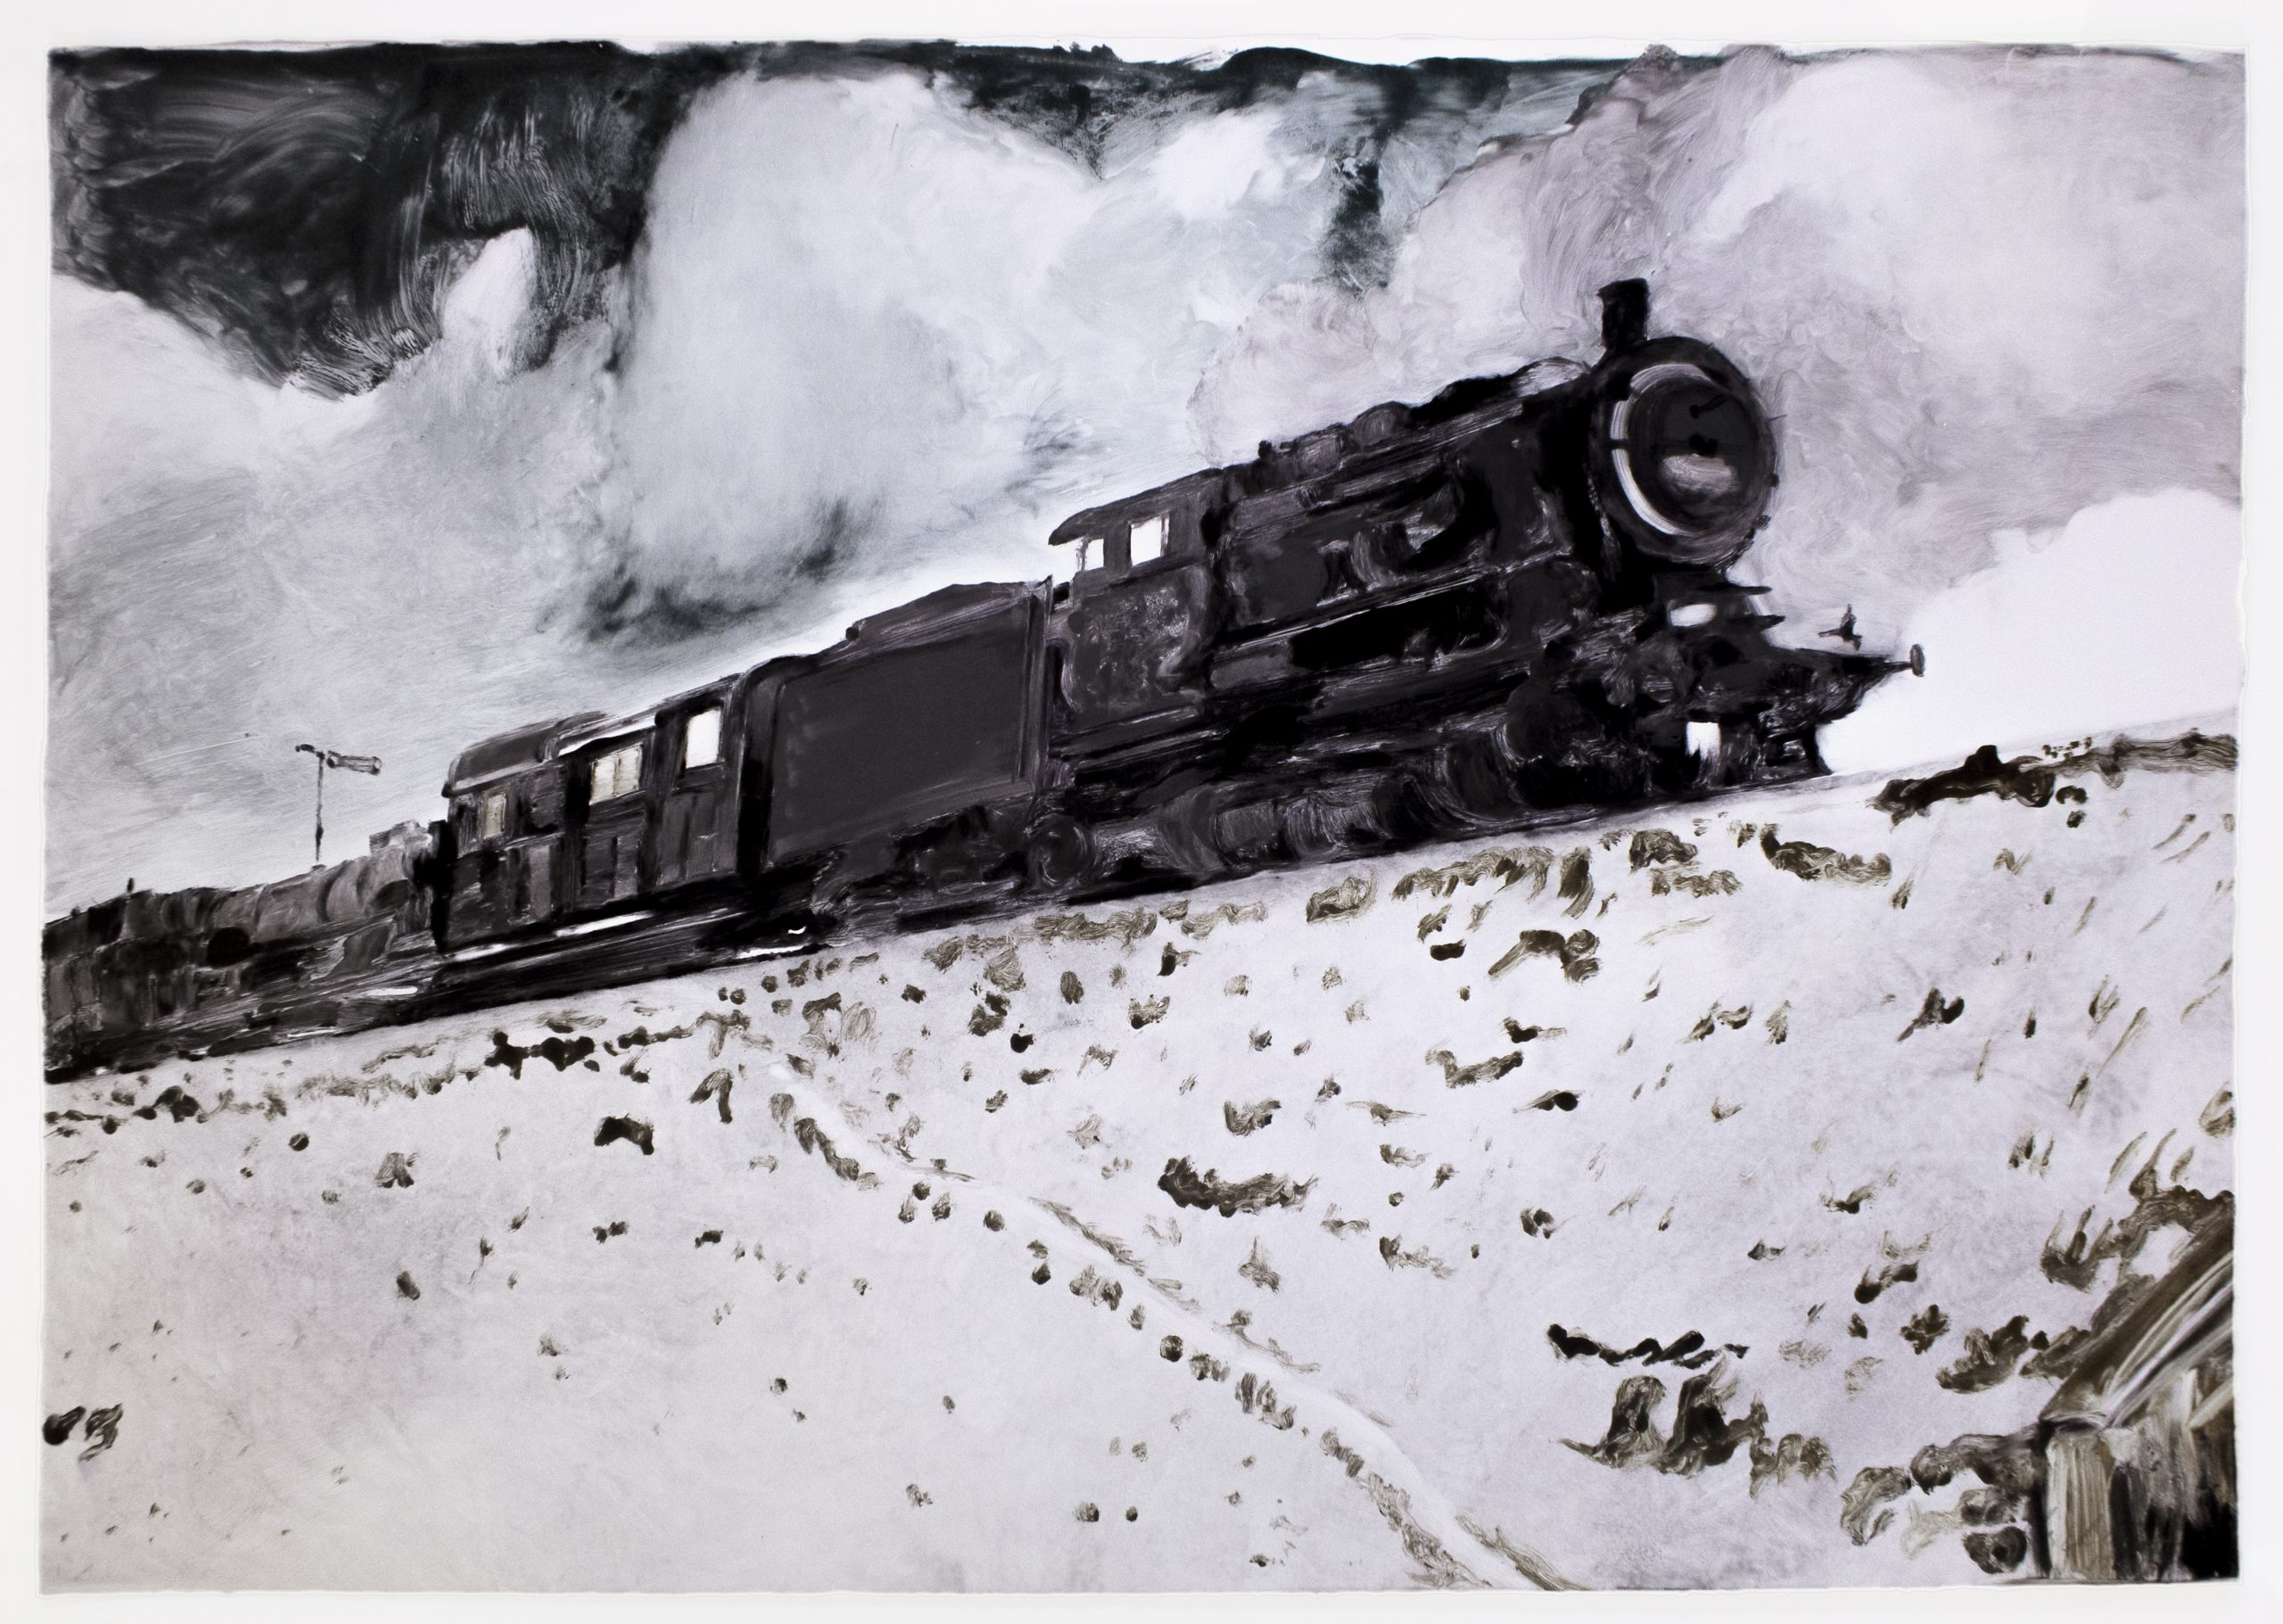 Train by Michele Zalopany